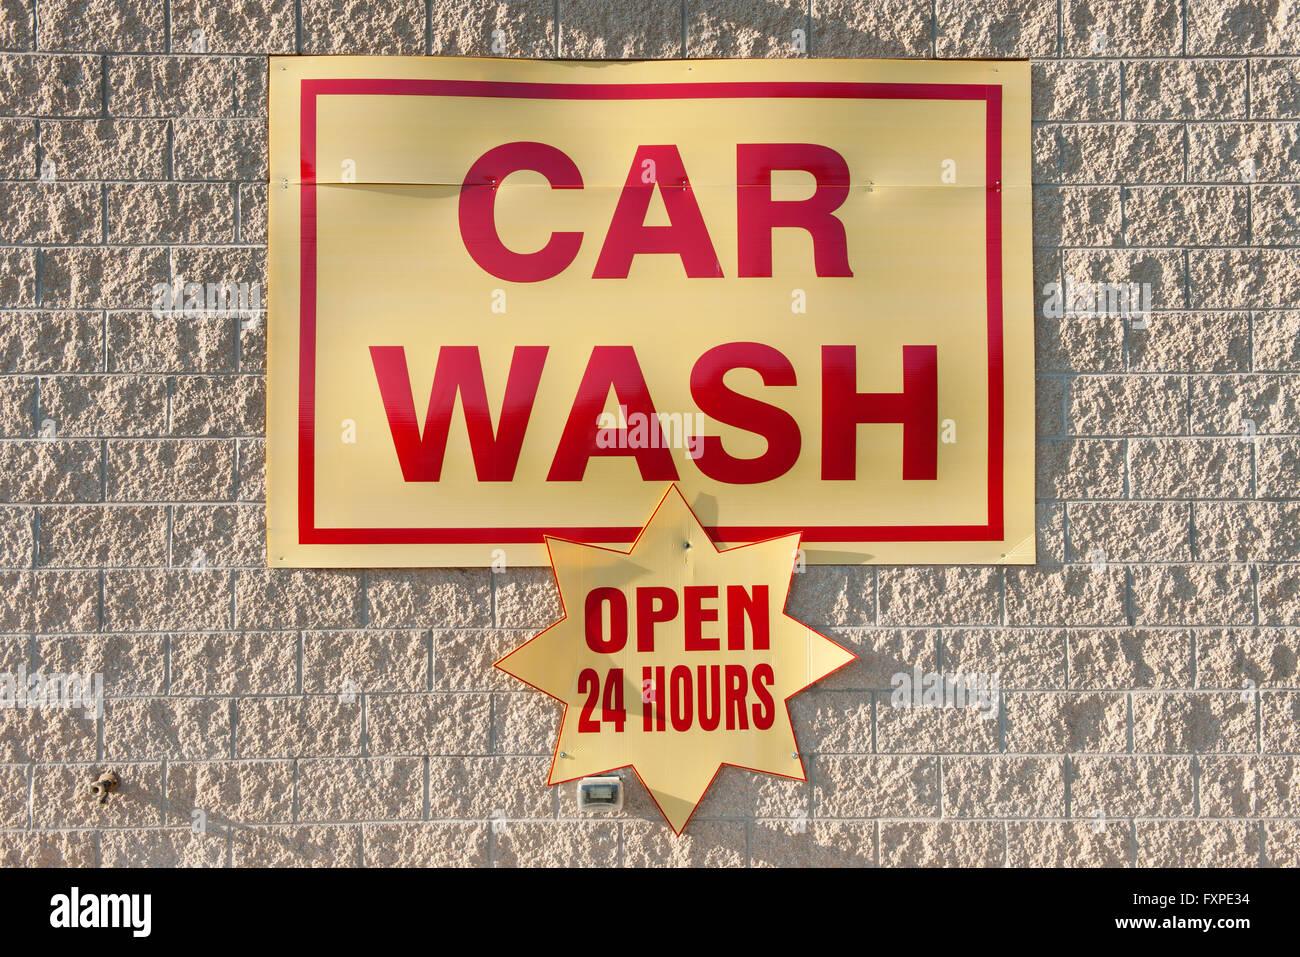 Car wash sign - Stock Image